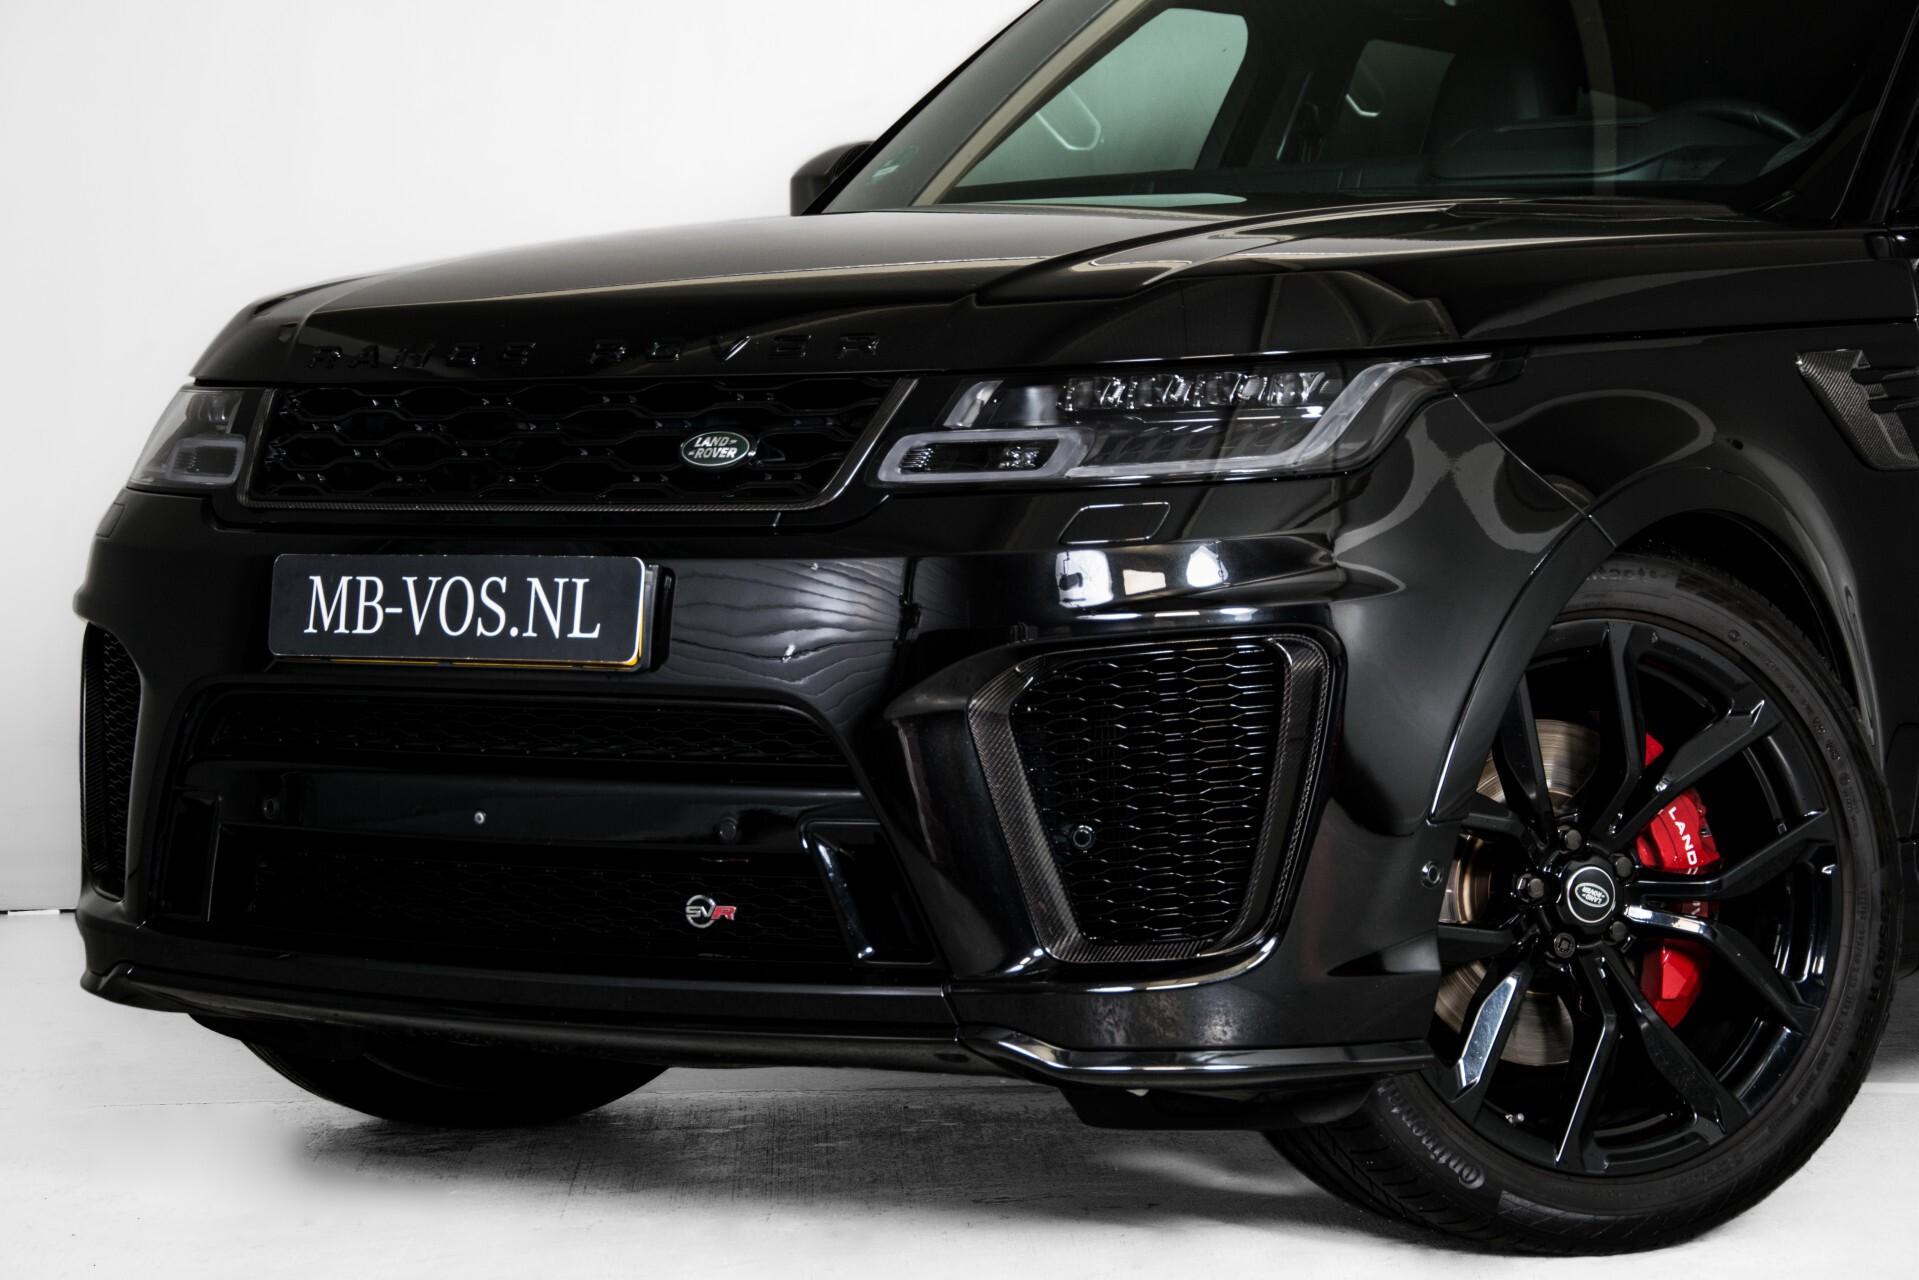 Land Rover Range Rover Sport SVR 5.0 Supercharged 575pk Full Carbon Nieuwprijs €241377 Foto 56